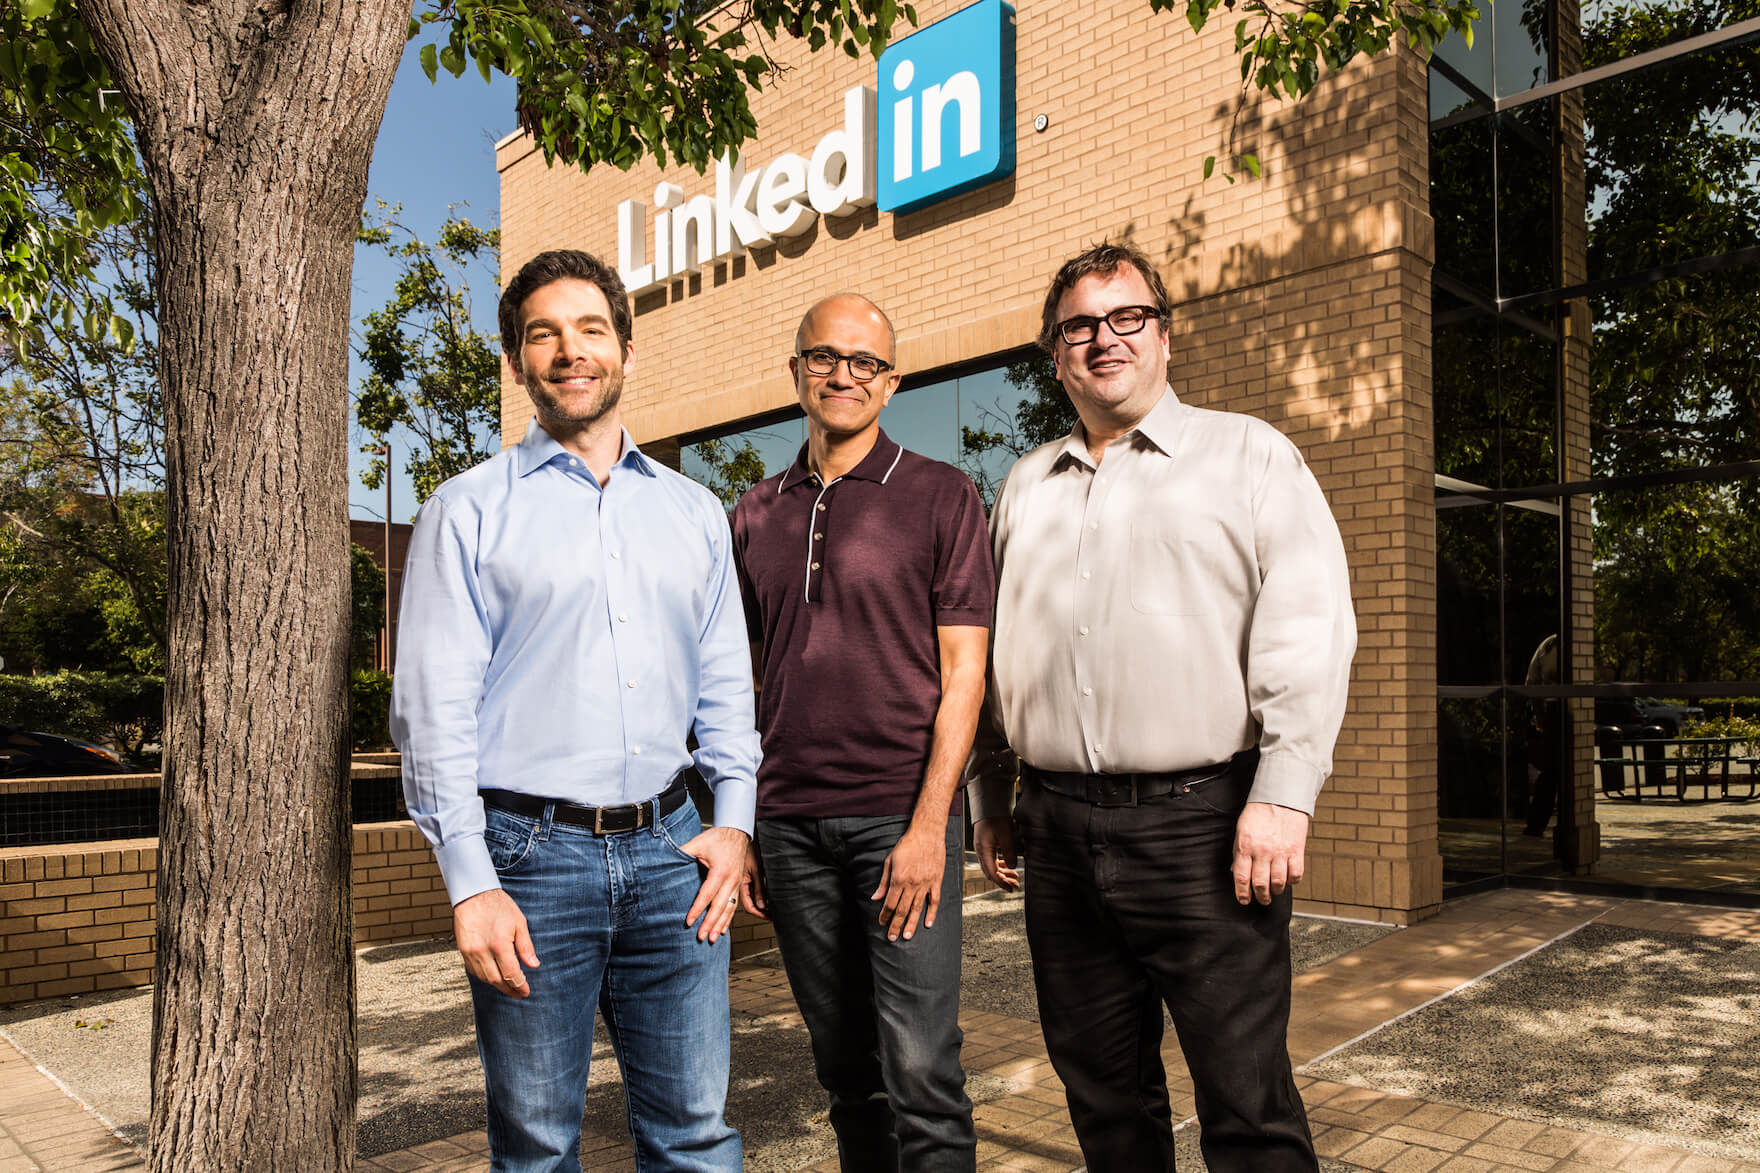 MS-Linkedin-2016-06-12-1-c.jpg